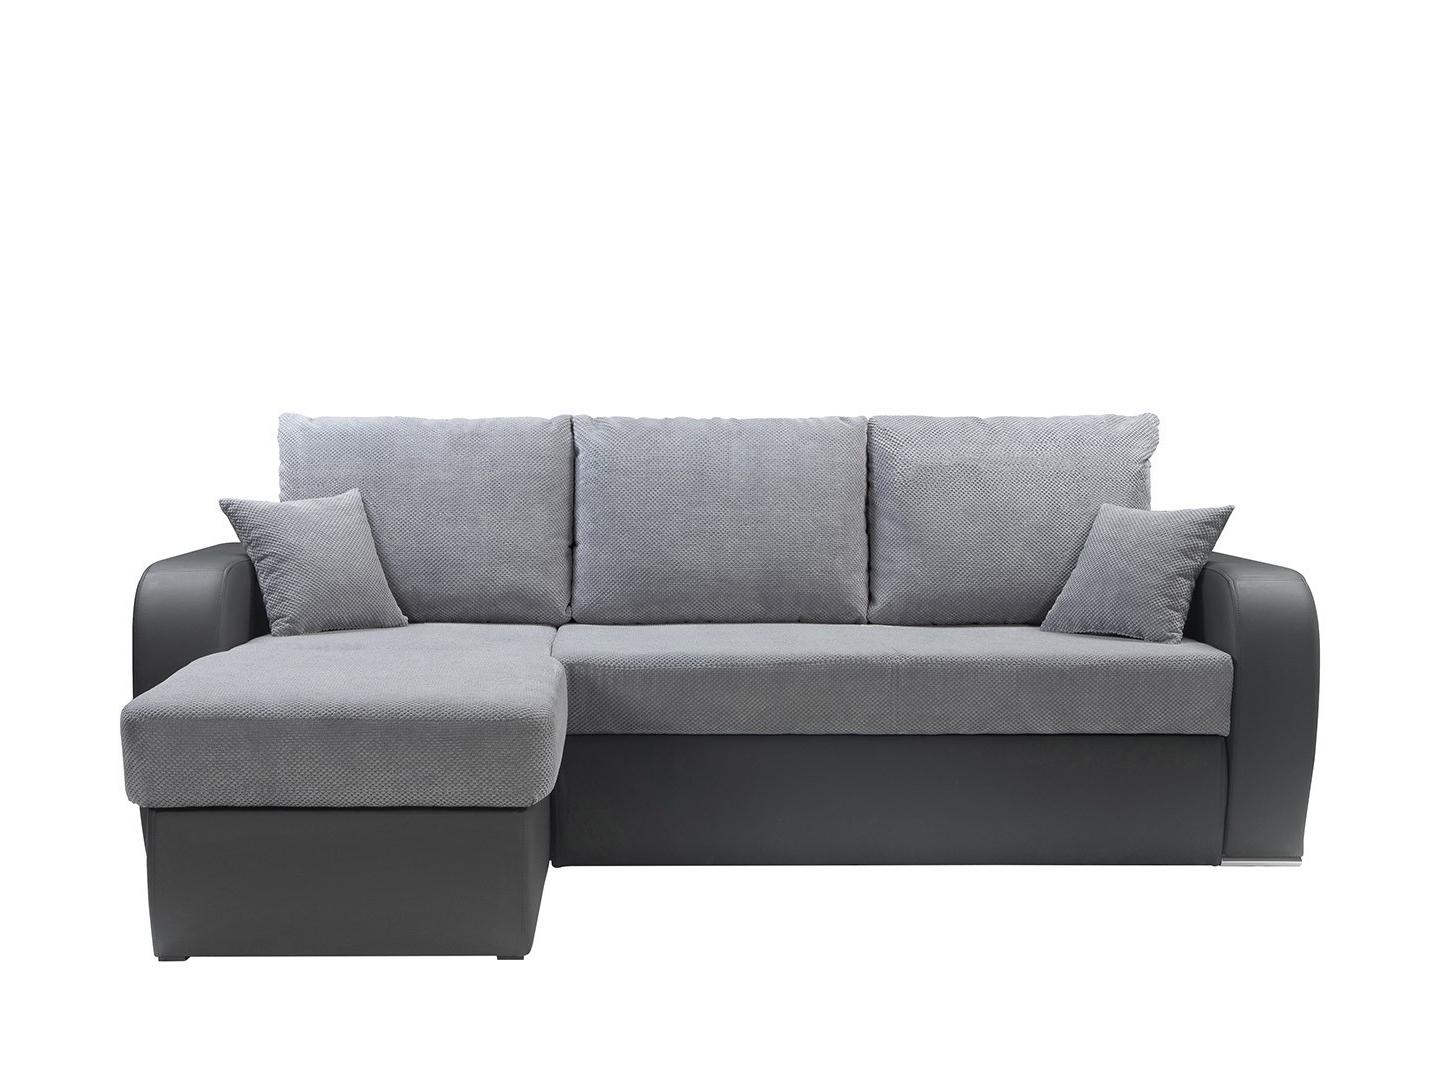 Most Recent Sofa : Corner Sofa Bed Brighton Corner Sofa Bed M&s Corner Sofa With Halifax Sectional Sofas (View 9 of 15)